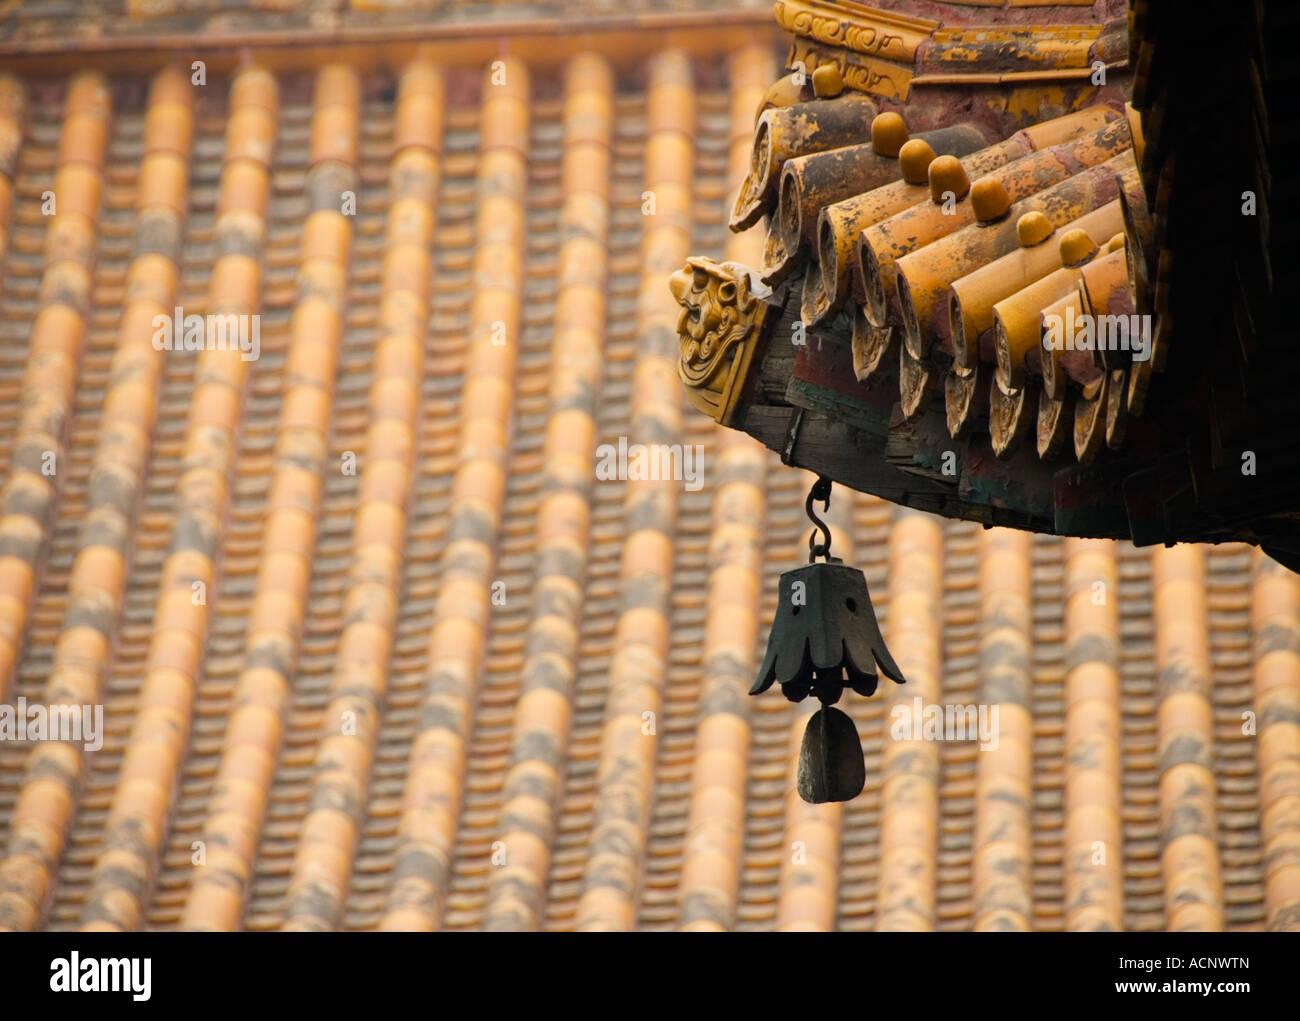 Bell und Dach eingehend Lama Tempel Yonghegong in Peking 2007 Stockfoto